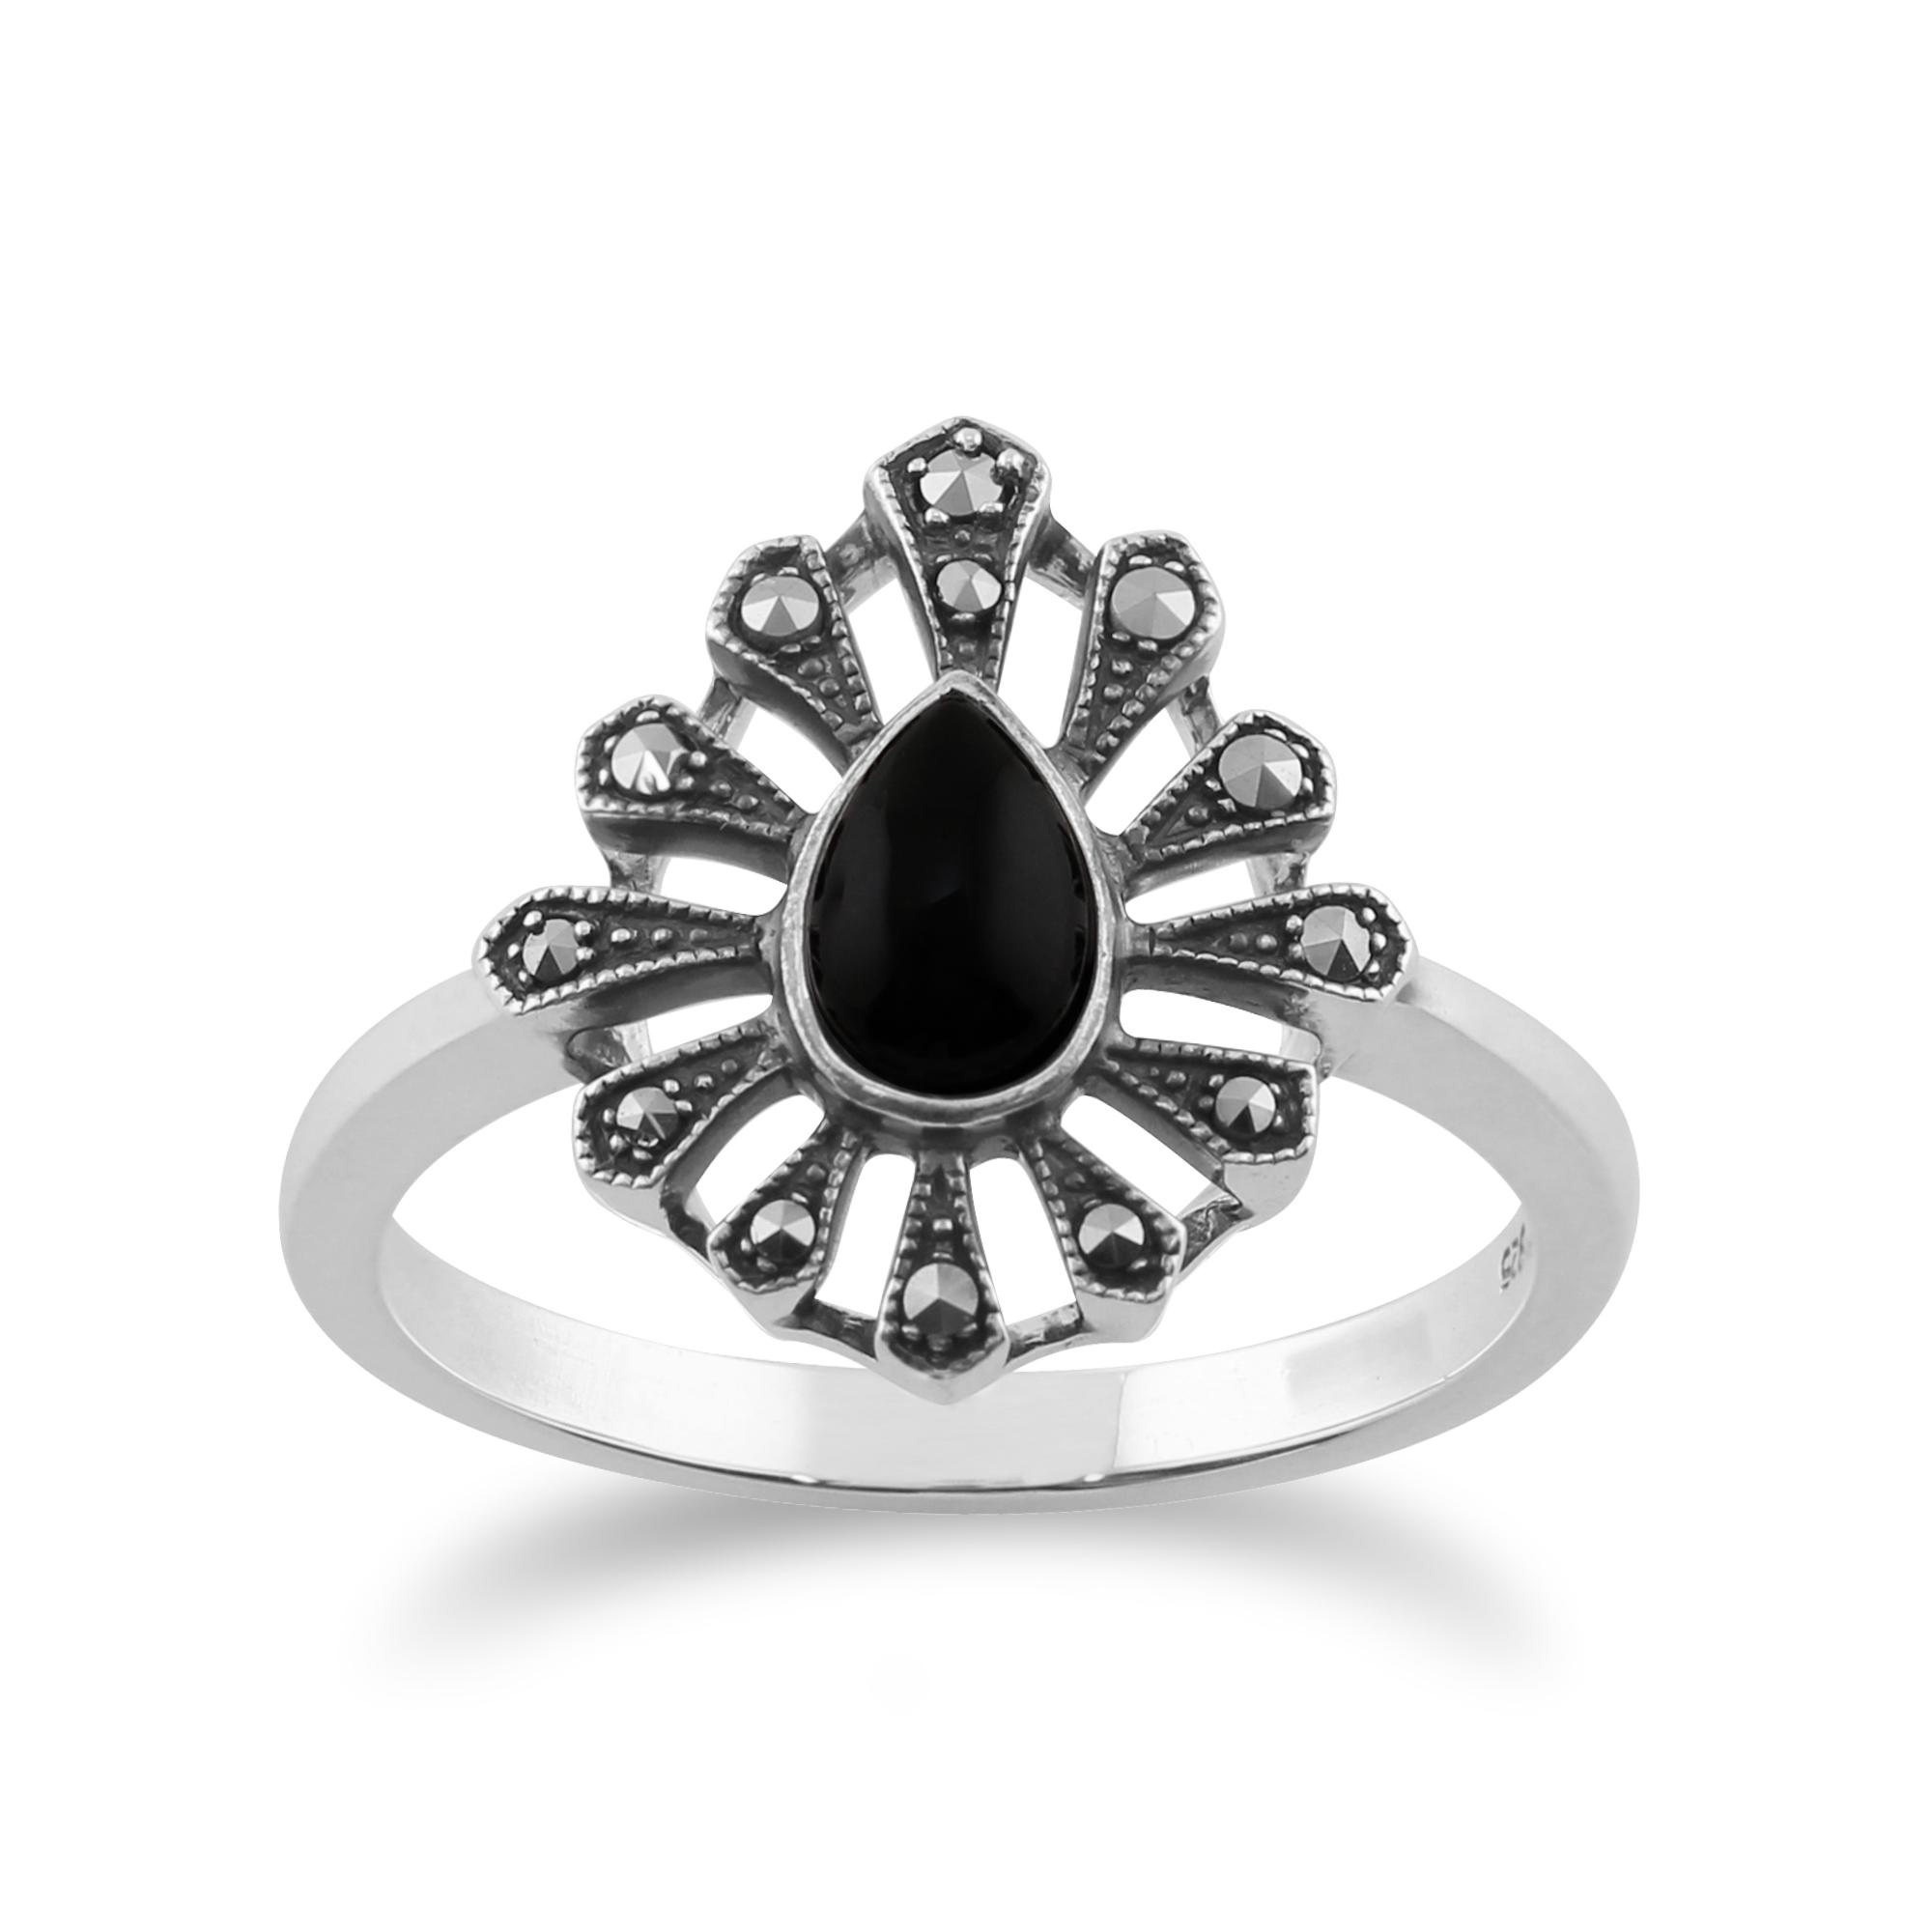 Gemondo 925 Sterling Silver 0.30ct Black Onyx /& Marcasite Art Deco Ring